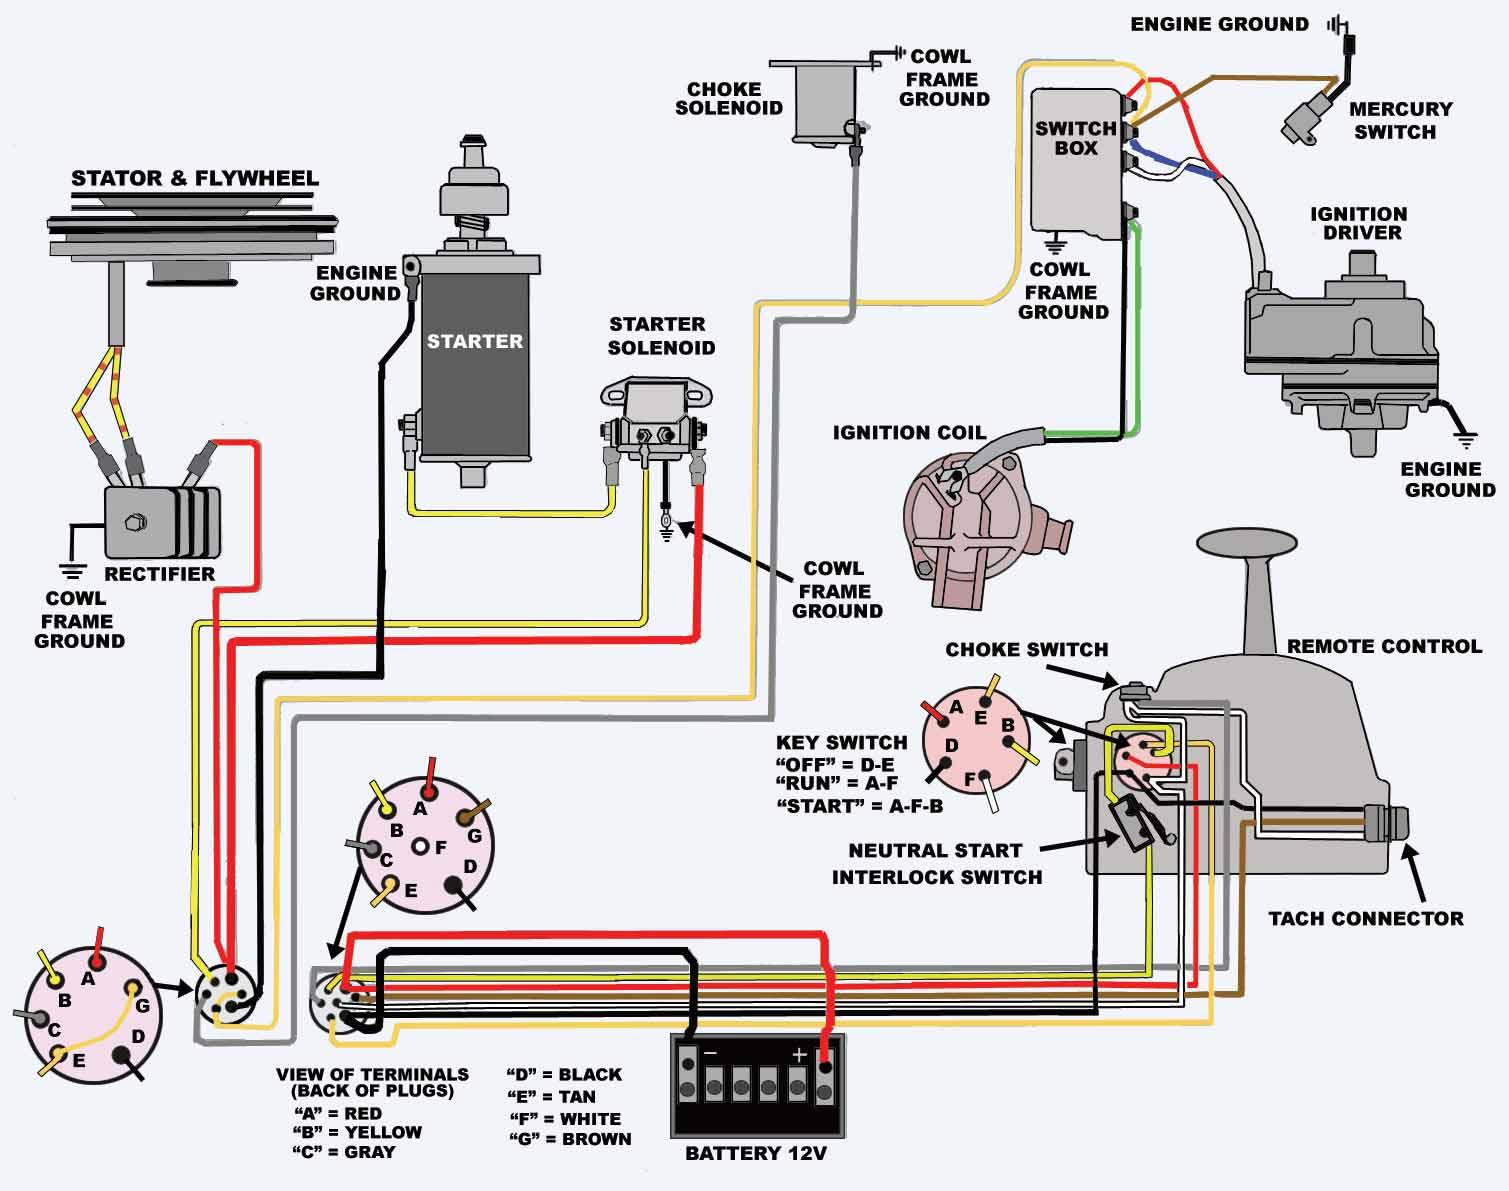 Mercury 50 Hp Thunderbolt Ignition Wiring Diagram Wiring Diagrams Make Hand Make Hand Ristorantealletrote It